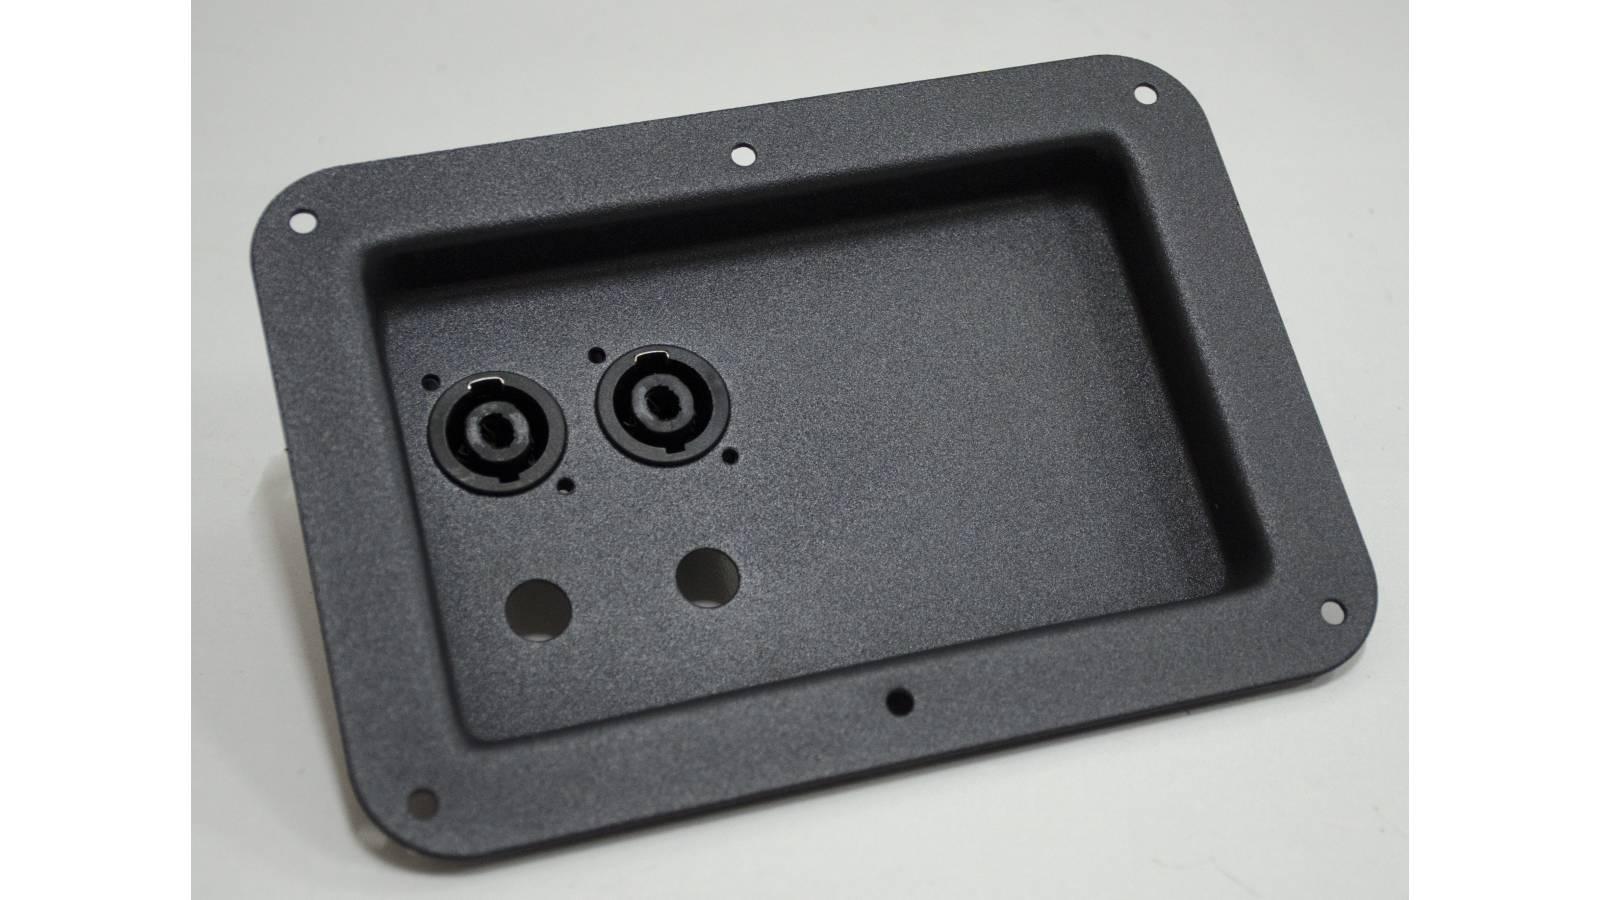 Bornera 100% metal para Bafles con Speakon chasis GCM Pro